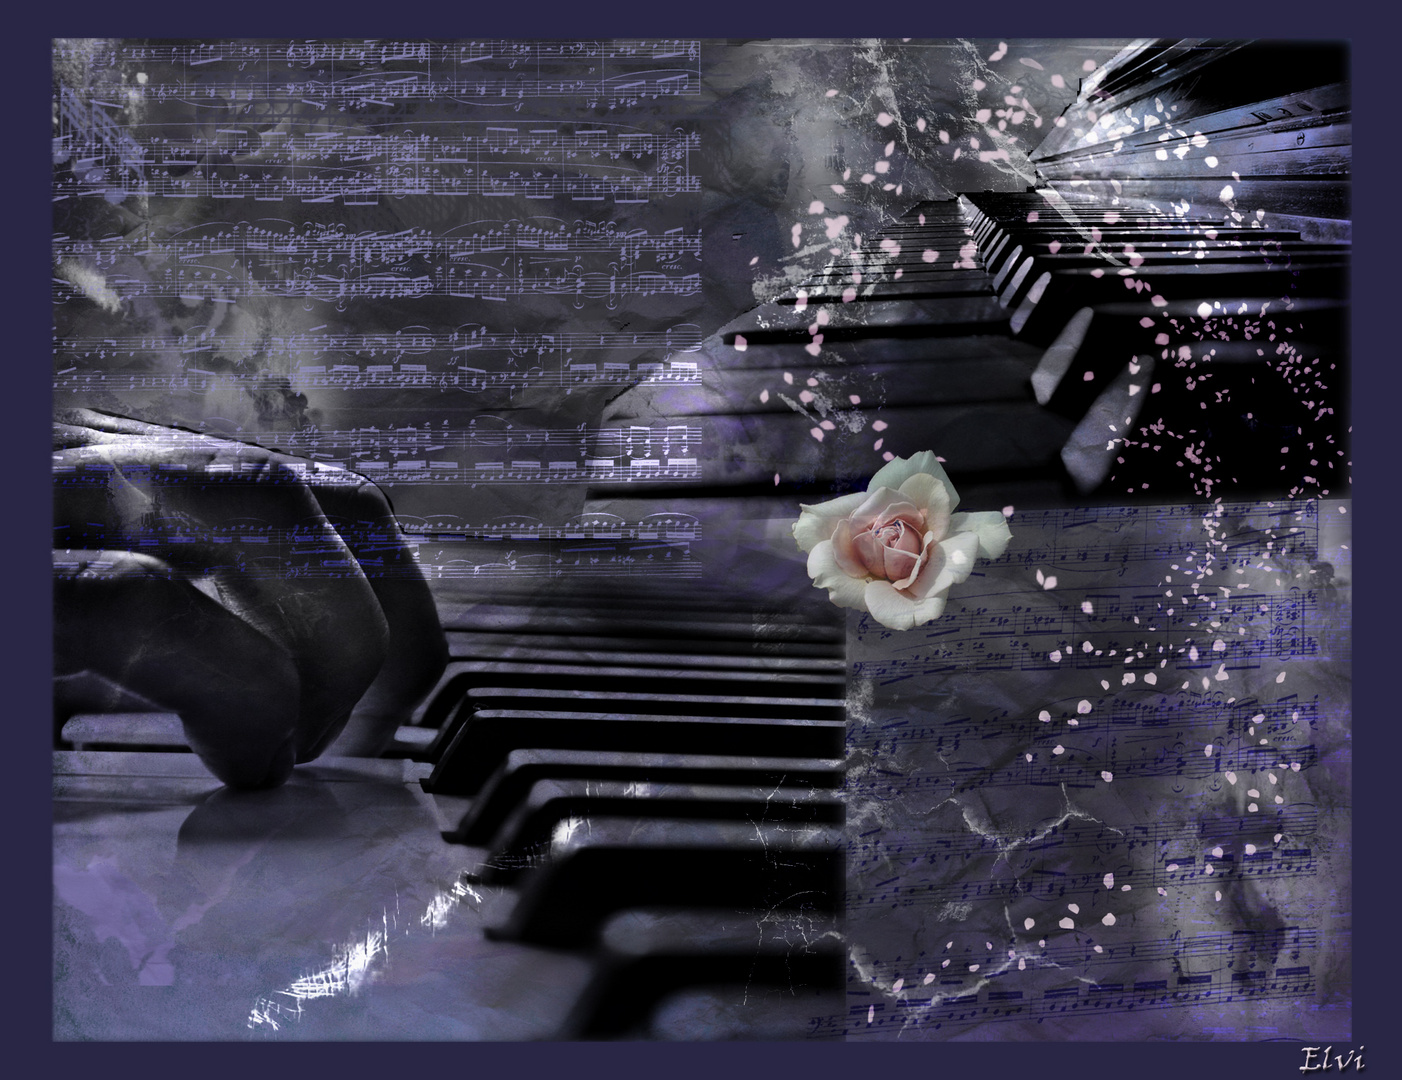 le son du piano